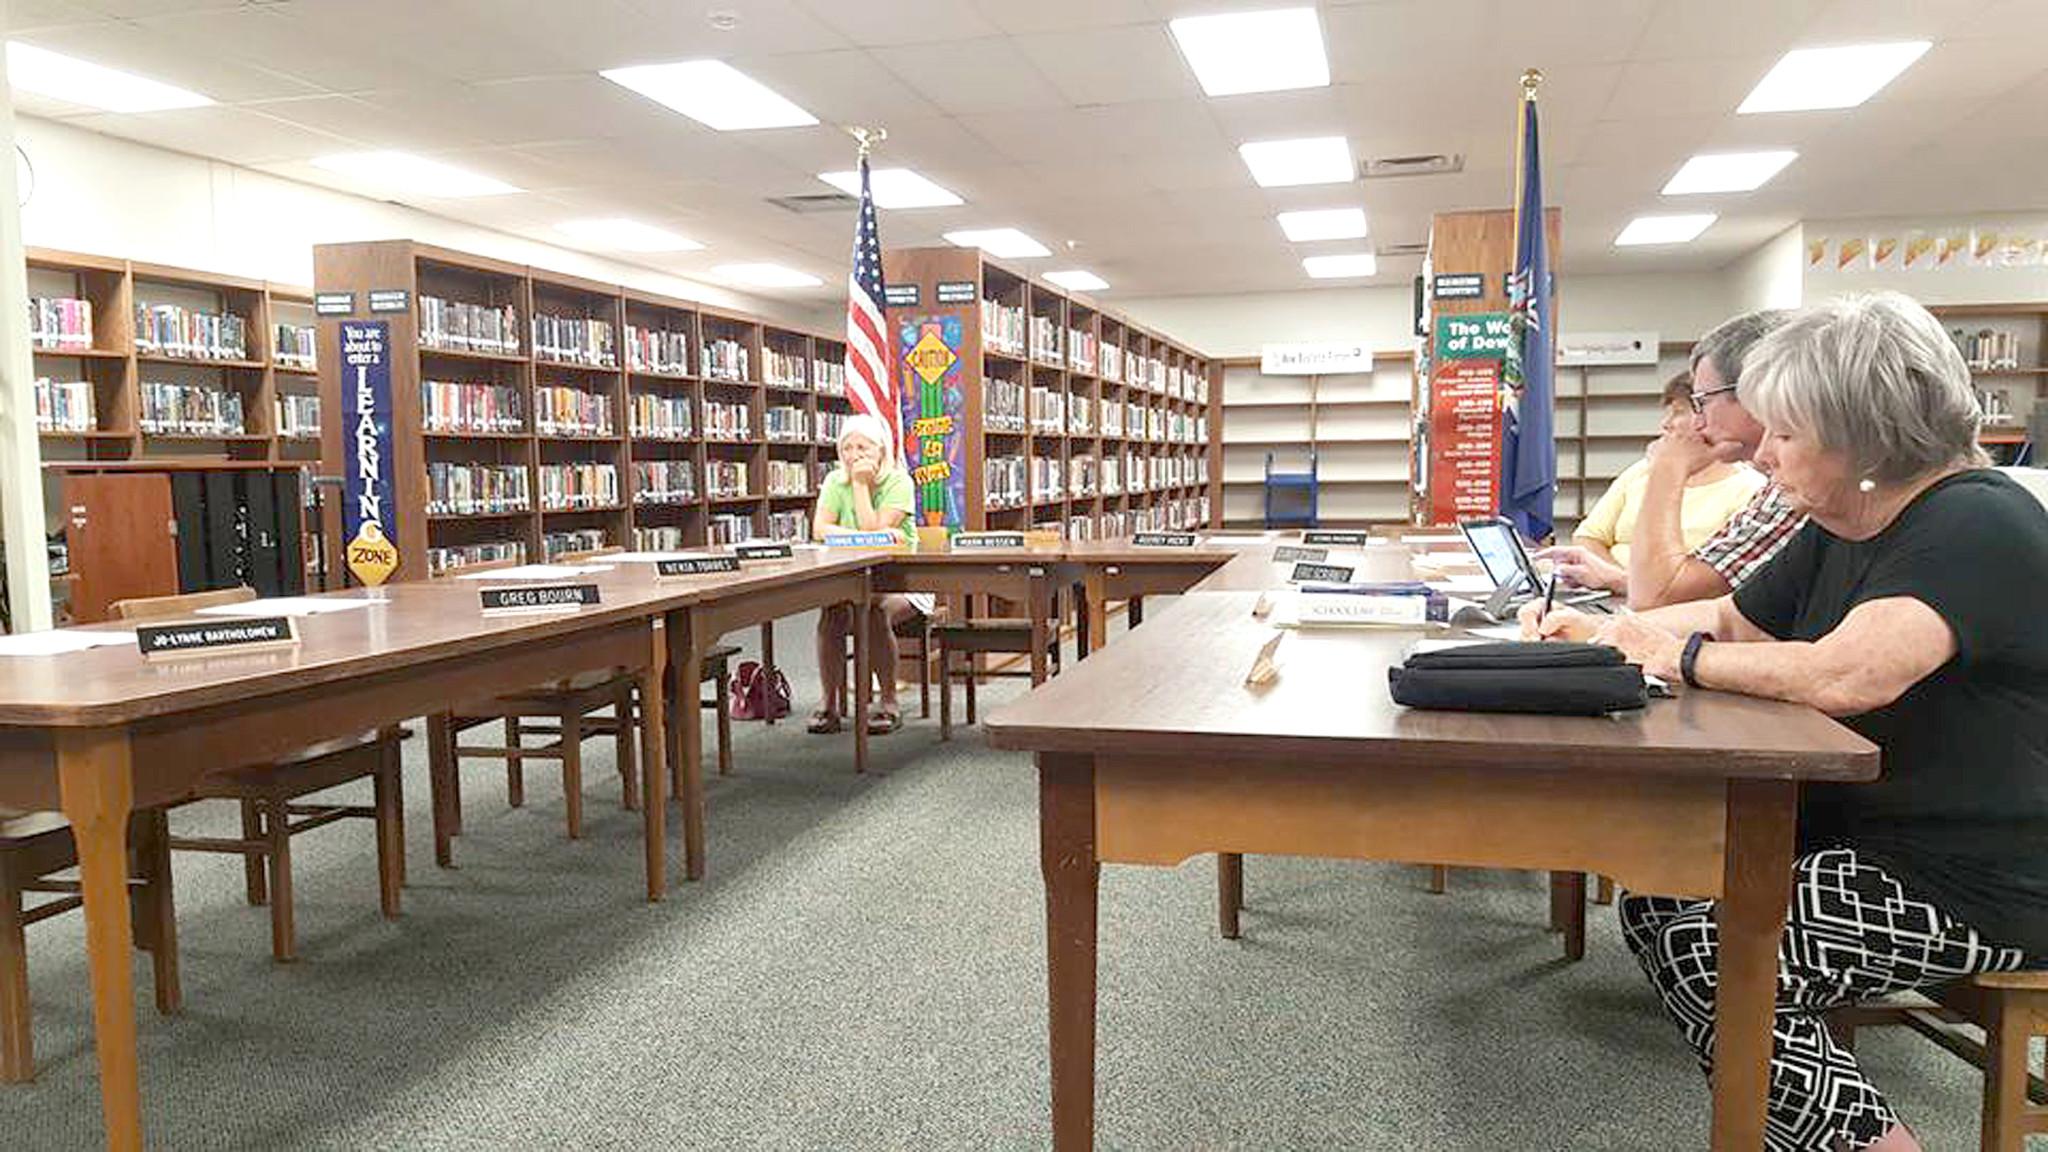 Granville school board rescinds Torres appointment